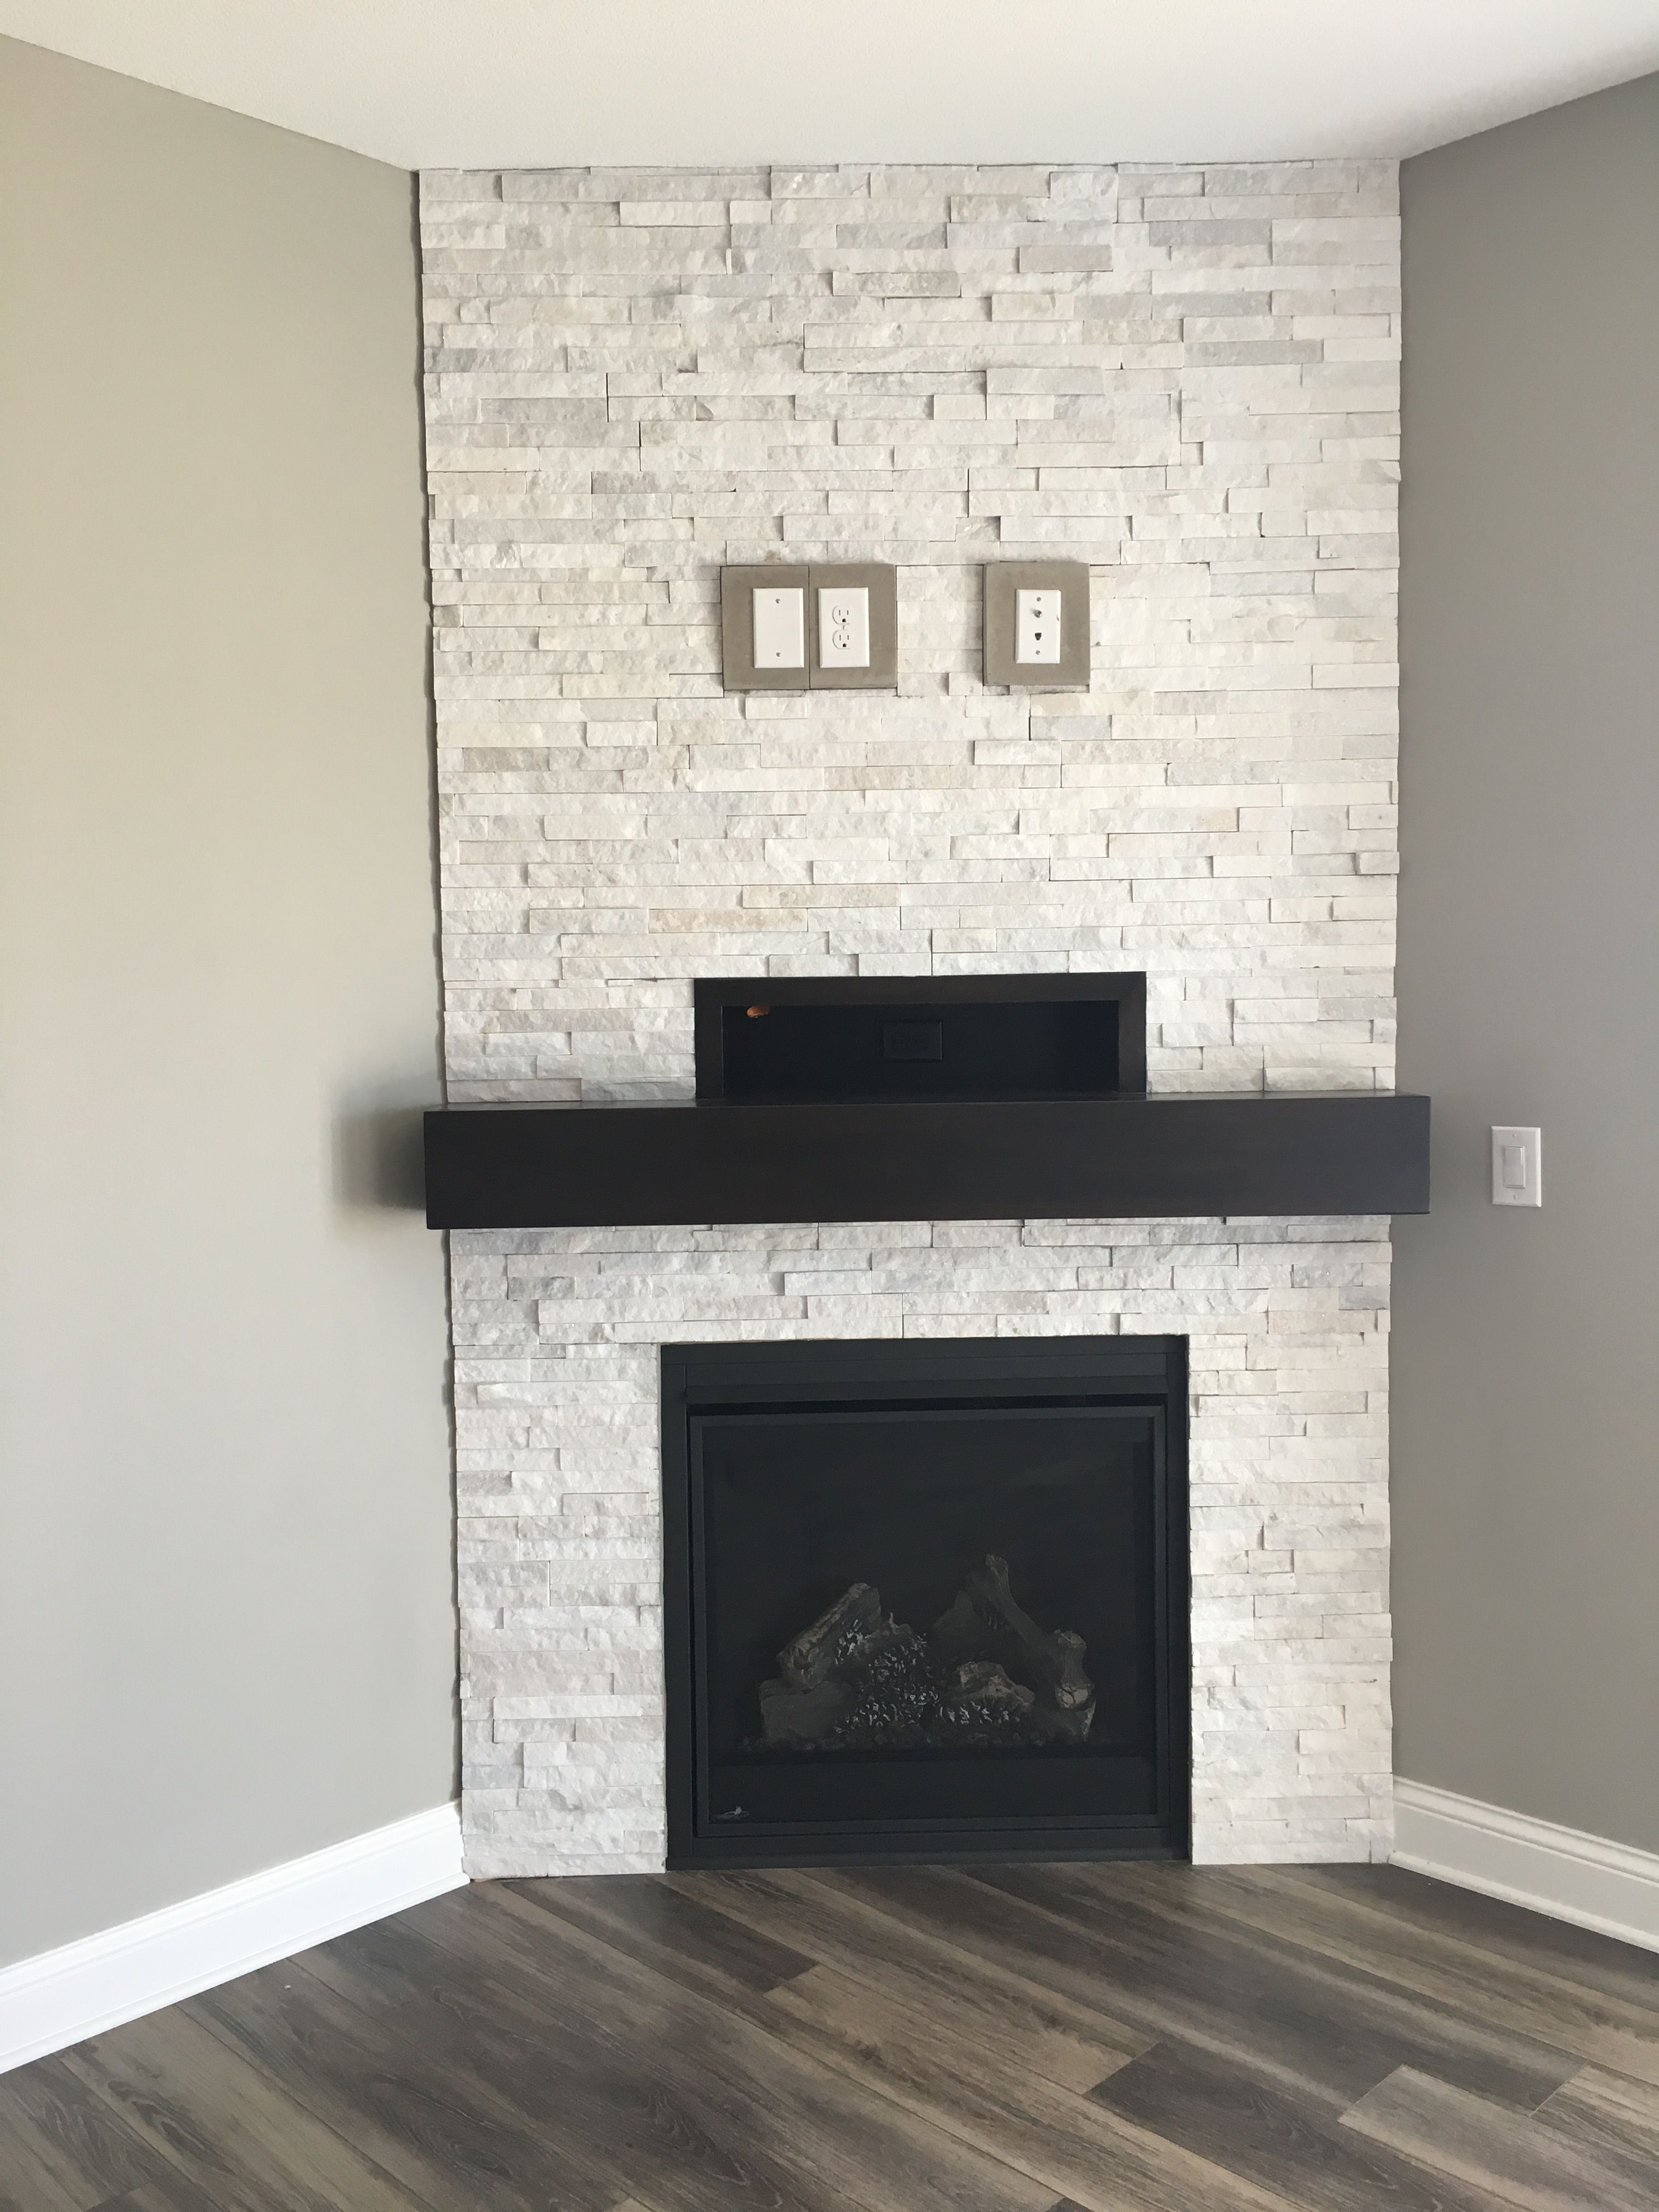 Fireplace Decorating Ideas Elegant Pin On Fireplace Ideas We Love